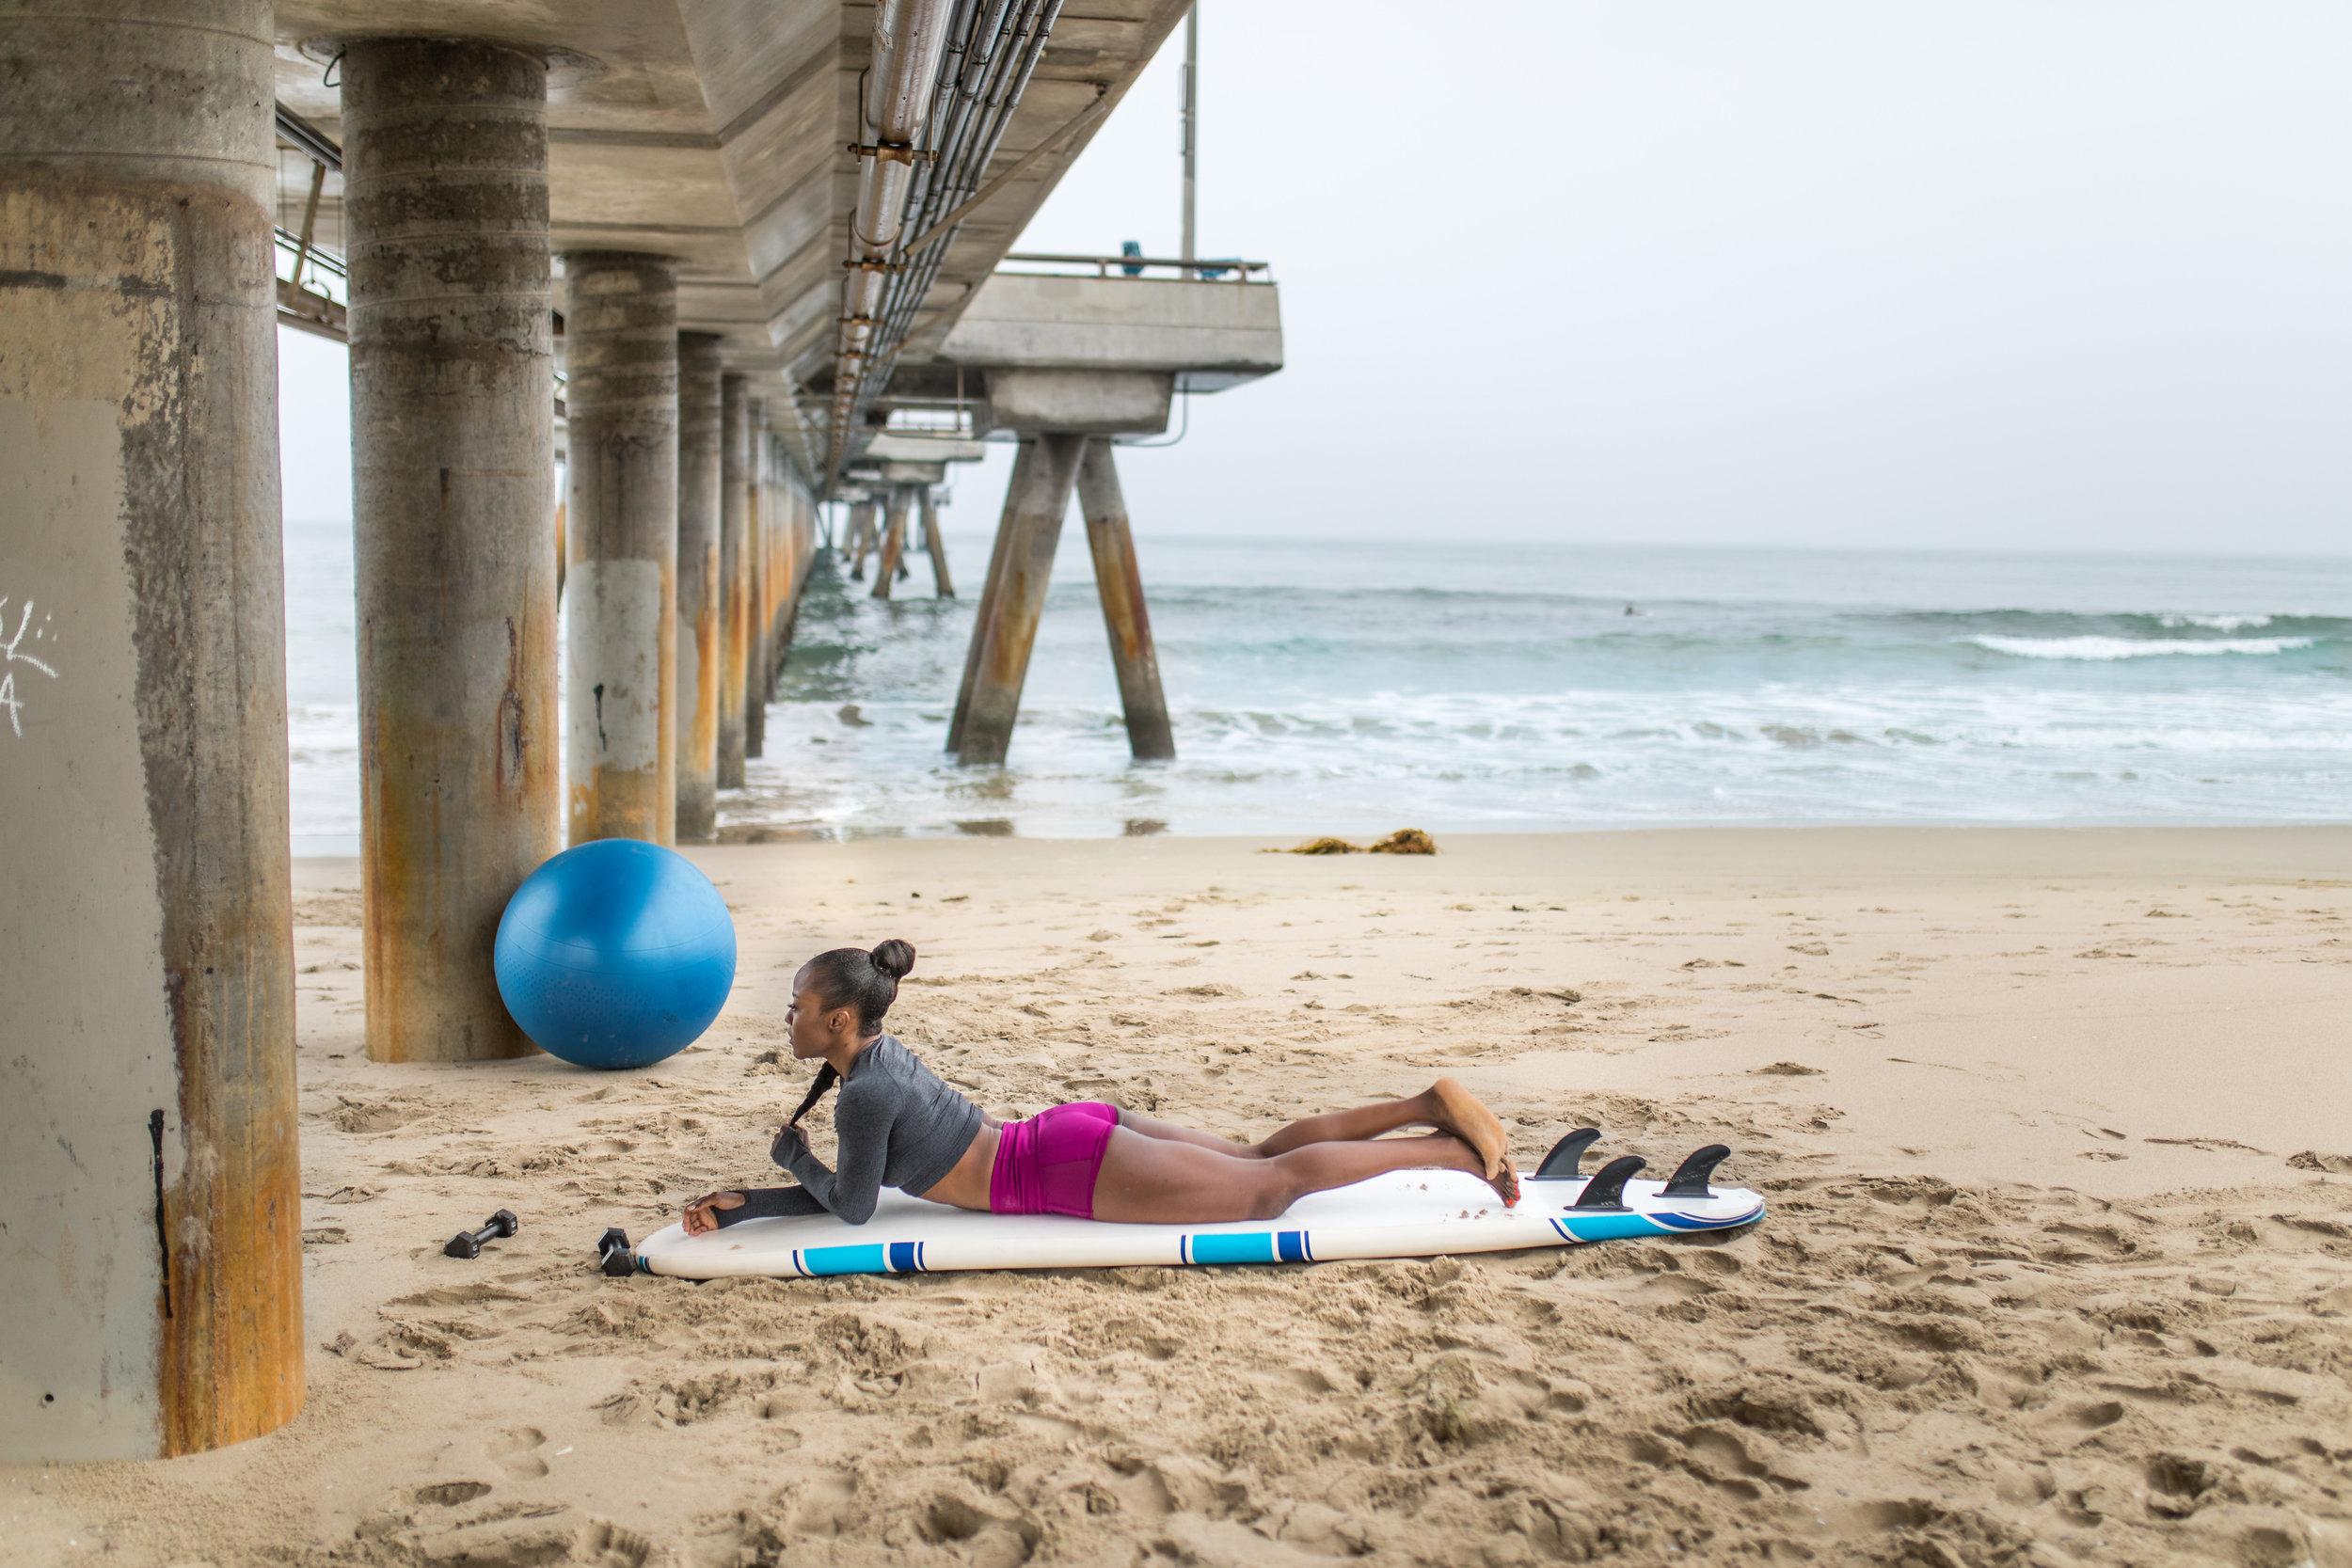 Livestrong_Surf Workout-41.JPG